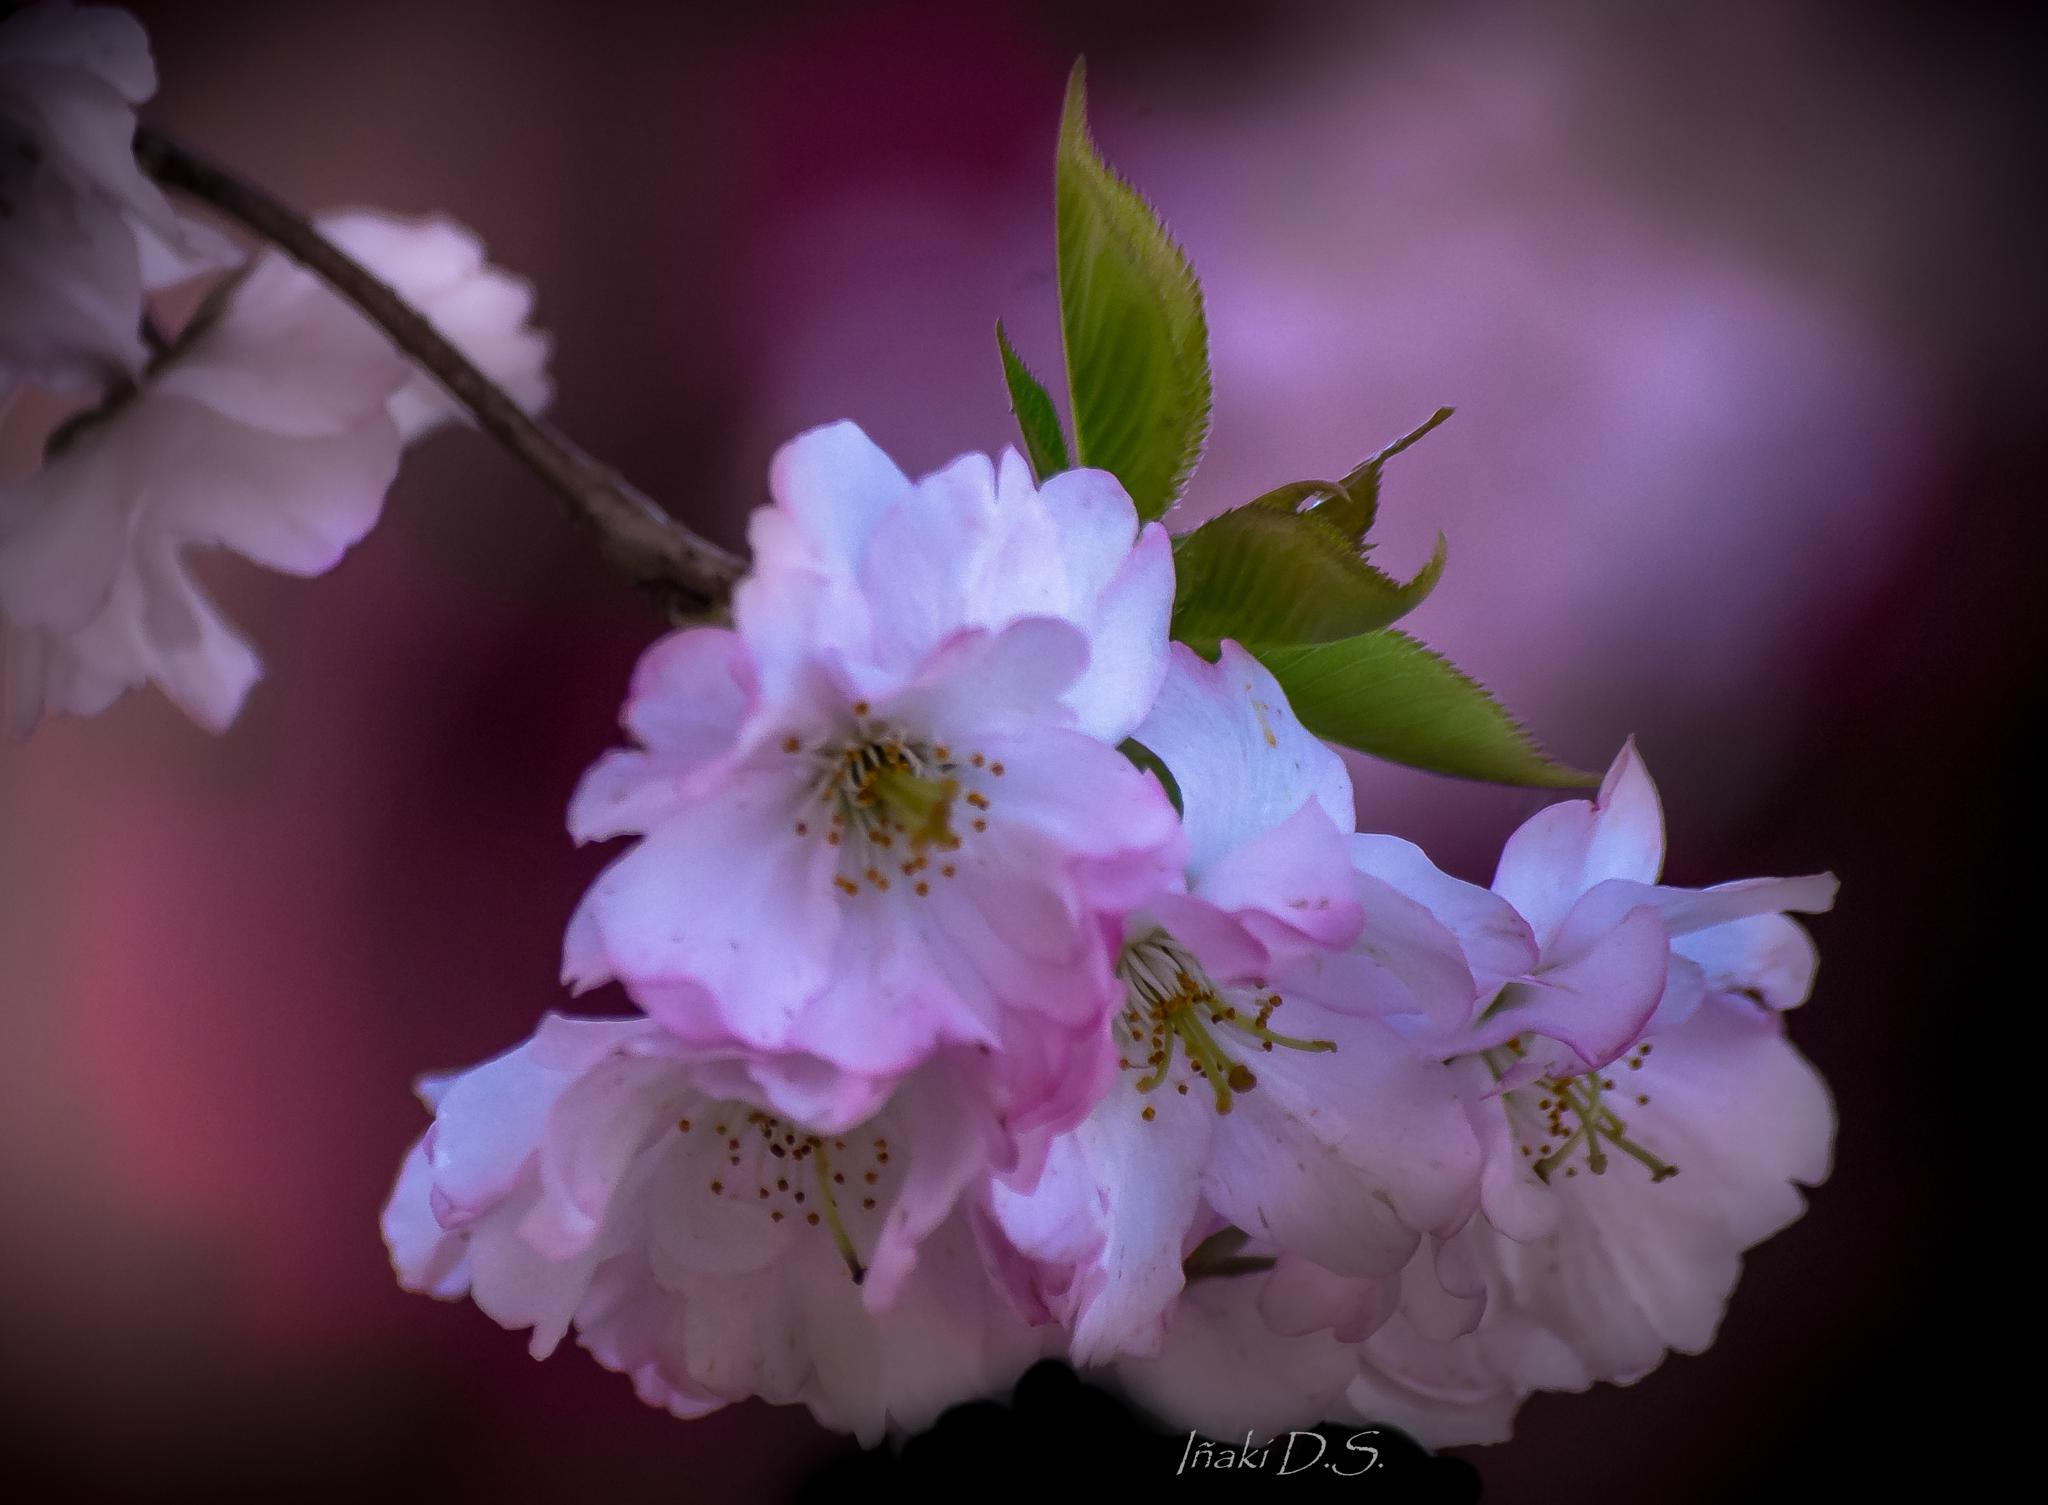 primavera en rosa by inaki.domin